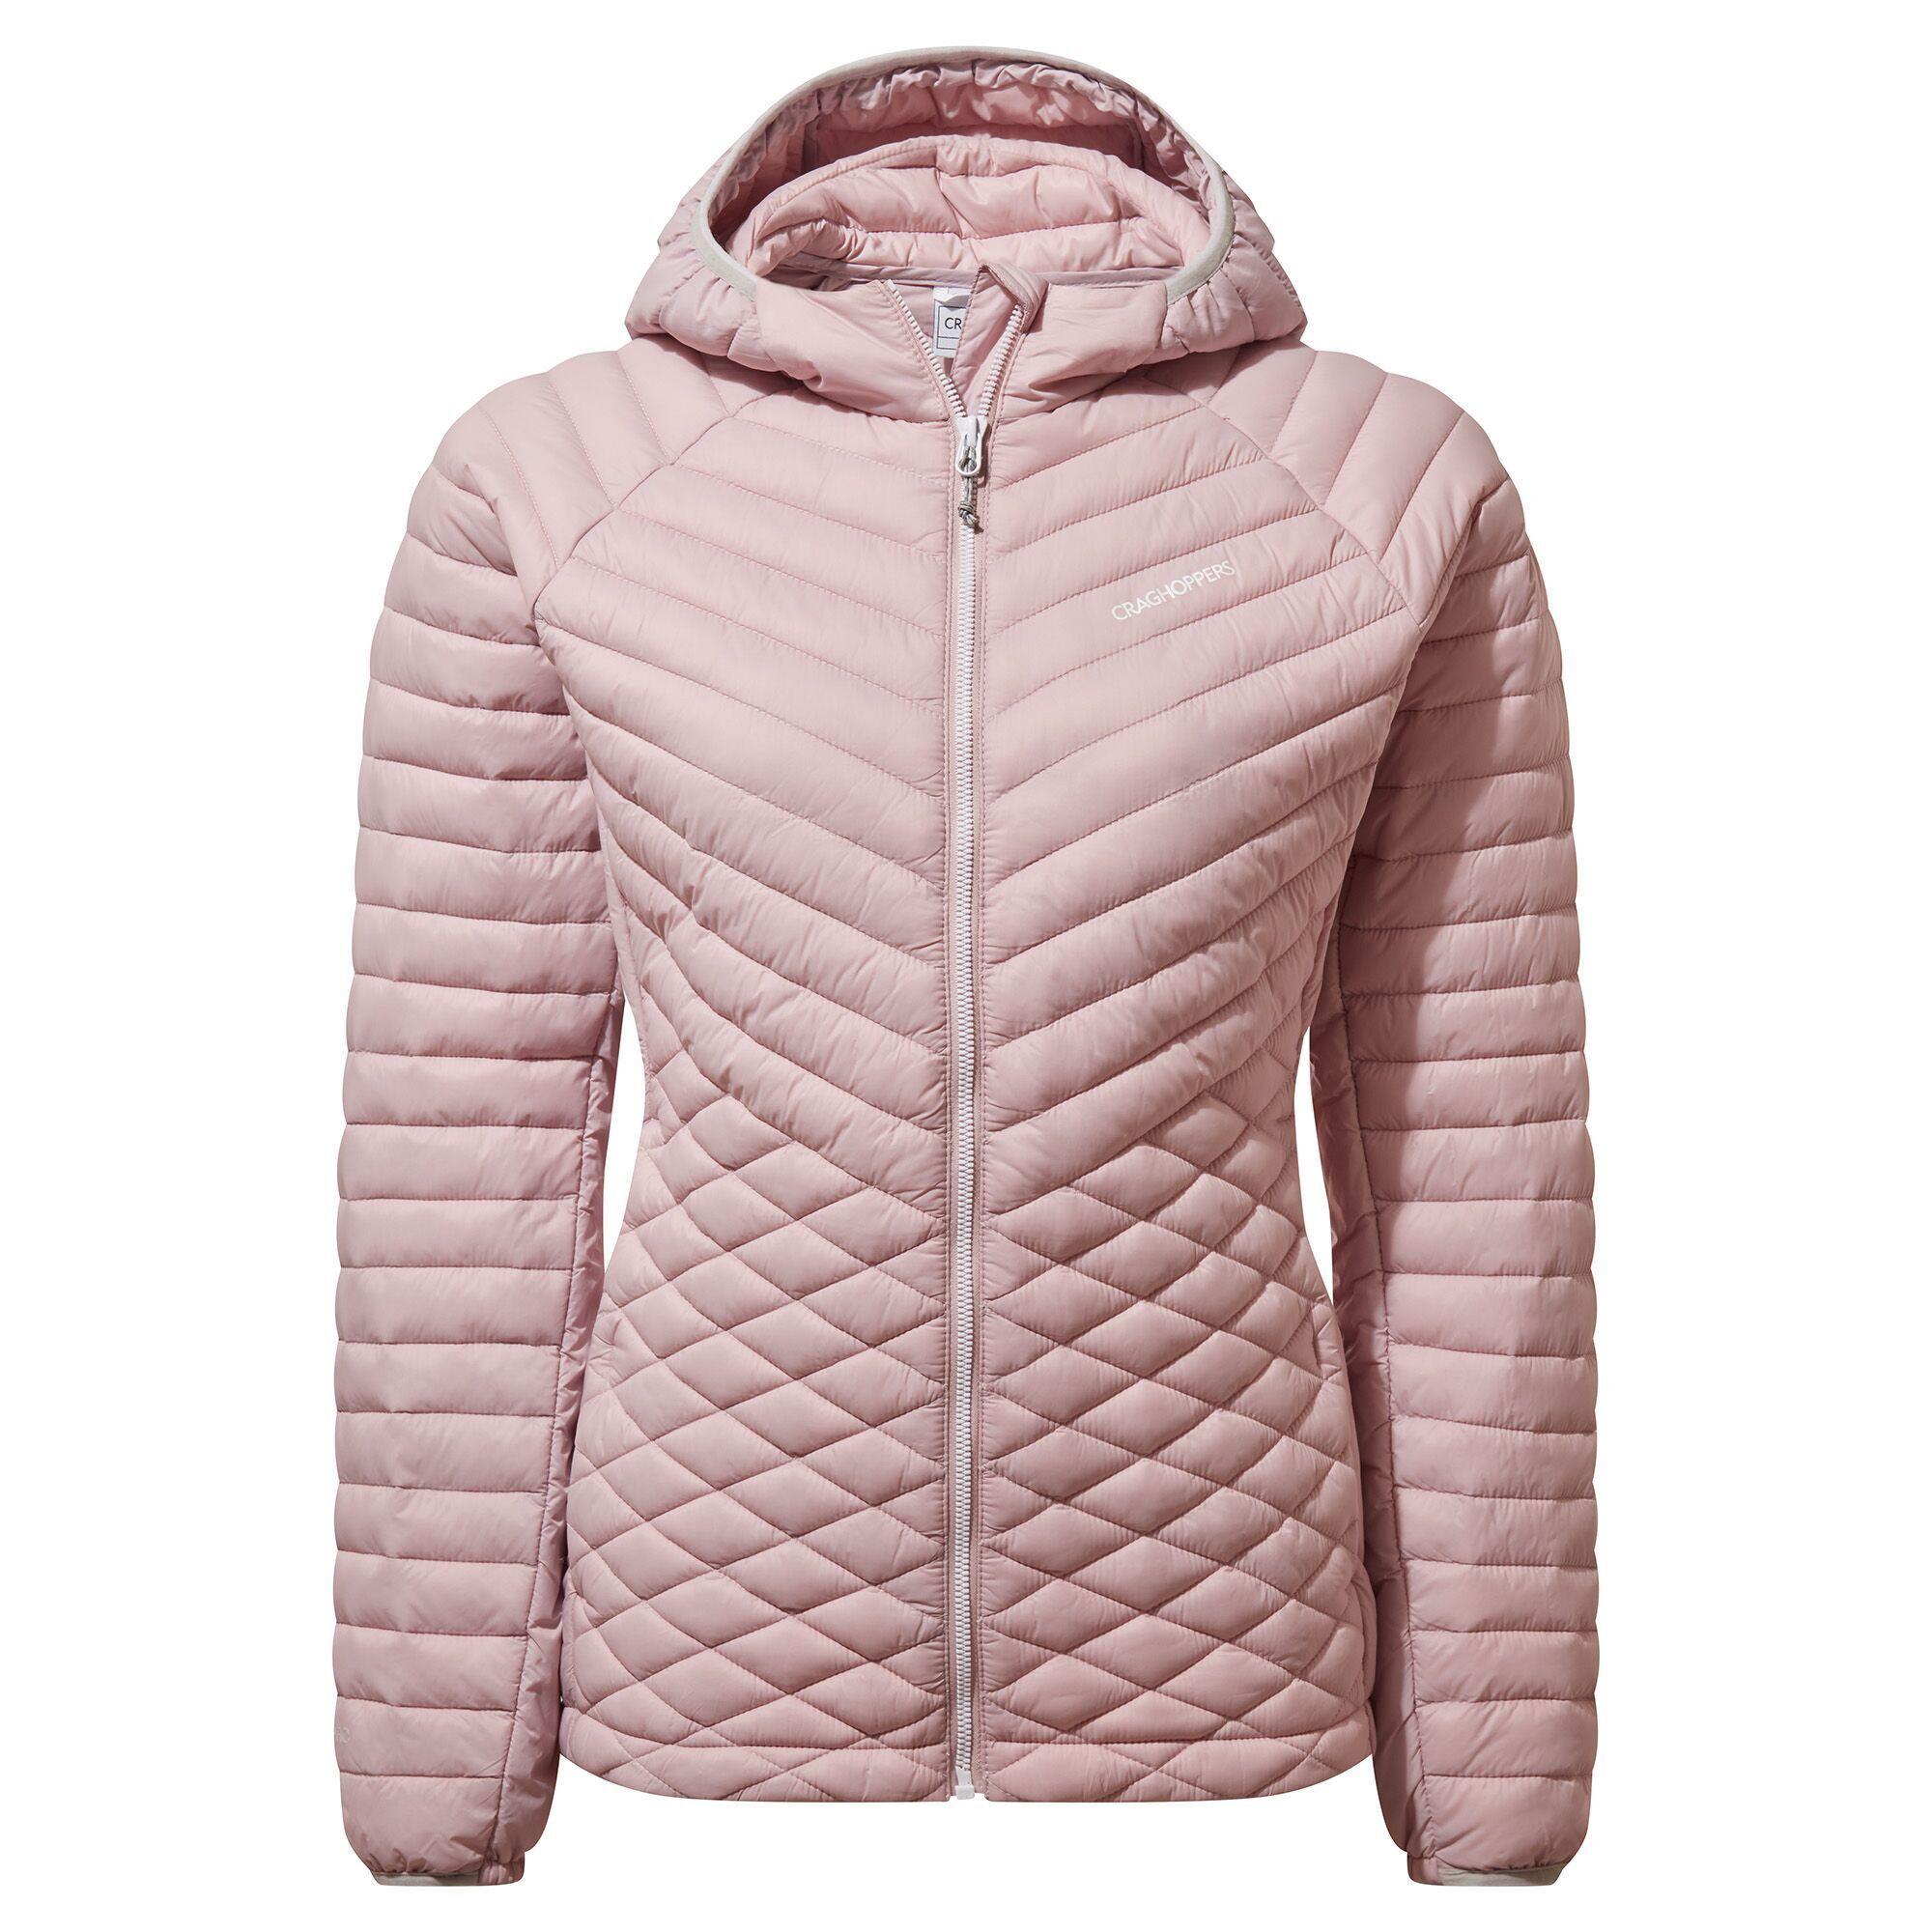 Craghoppers Womens/Ladies Expolite Hooded Jacket (Brushed Lilac)